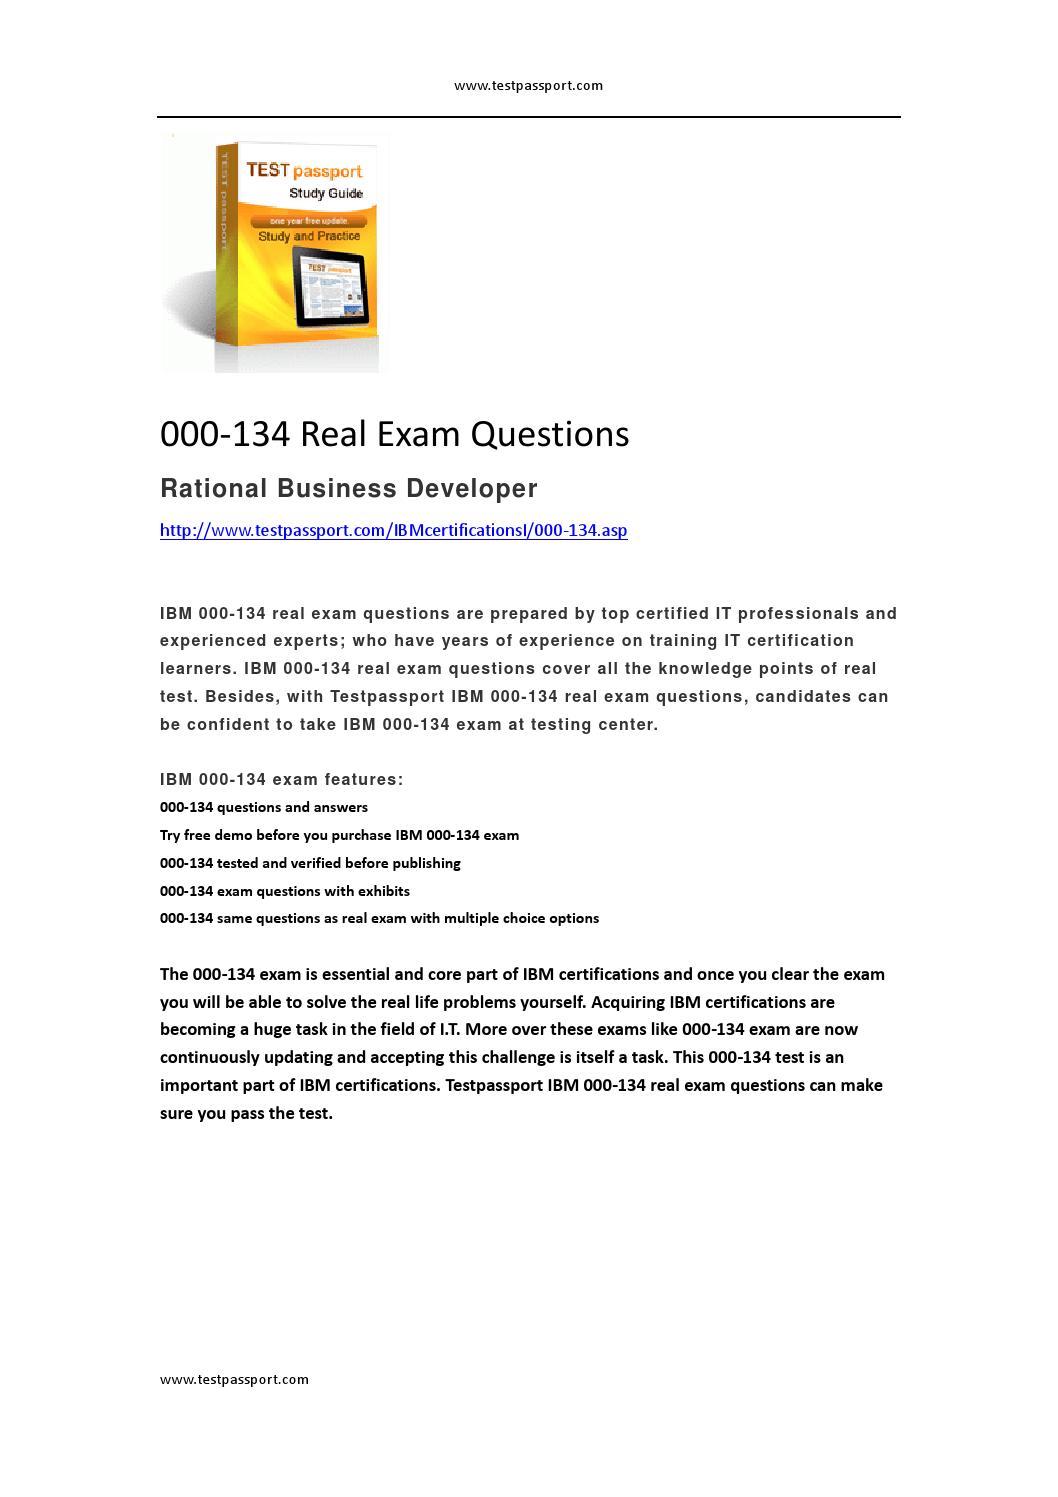 Ibm 000 134 Real Exam Questions By Mallett Issuu